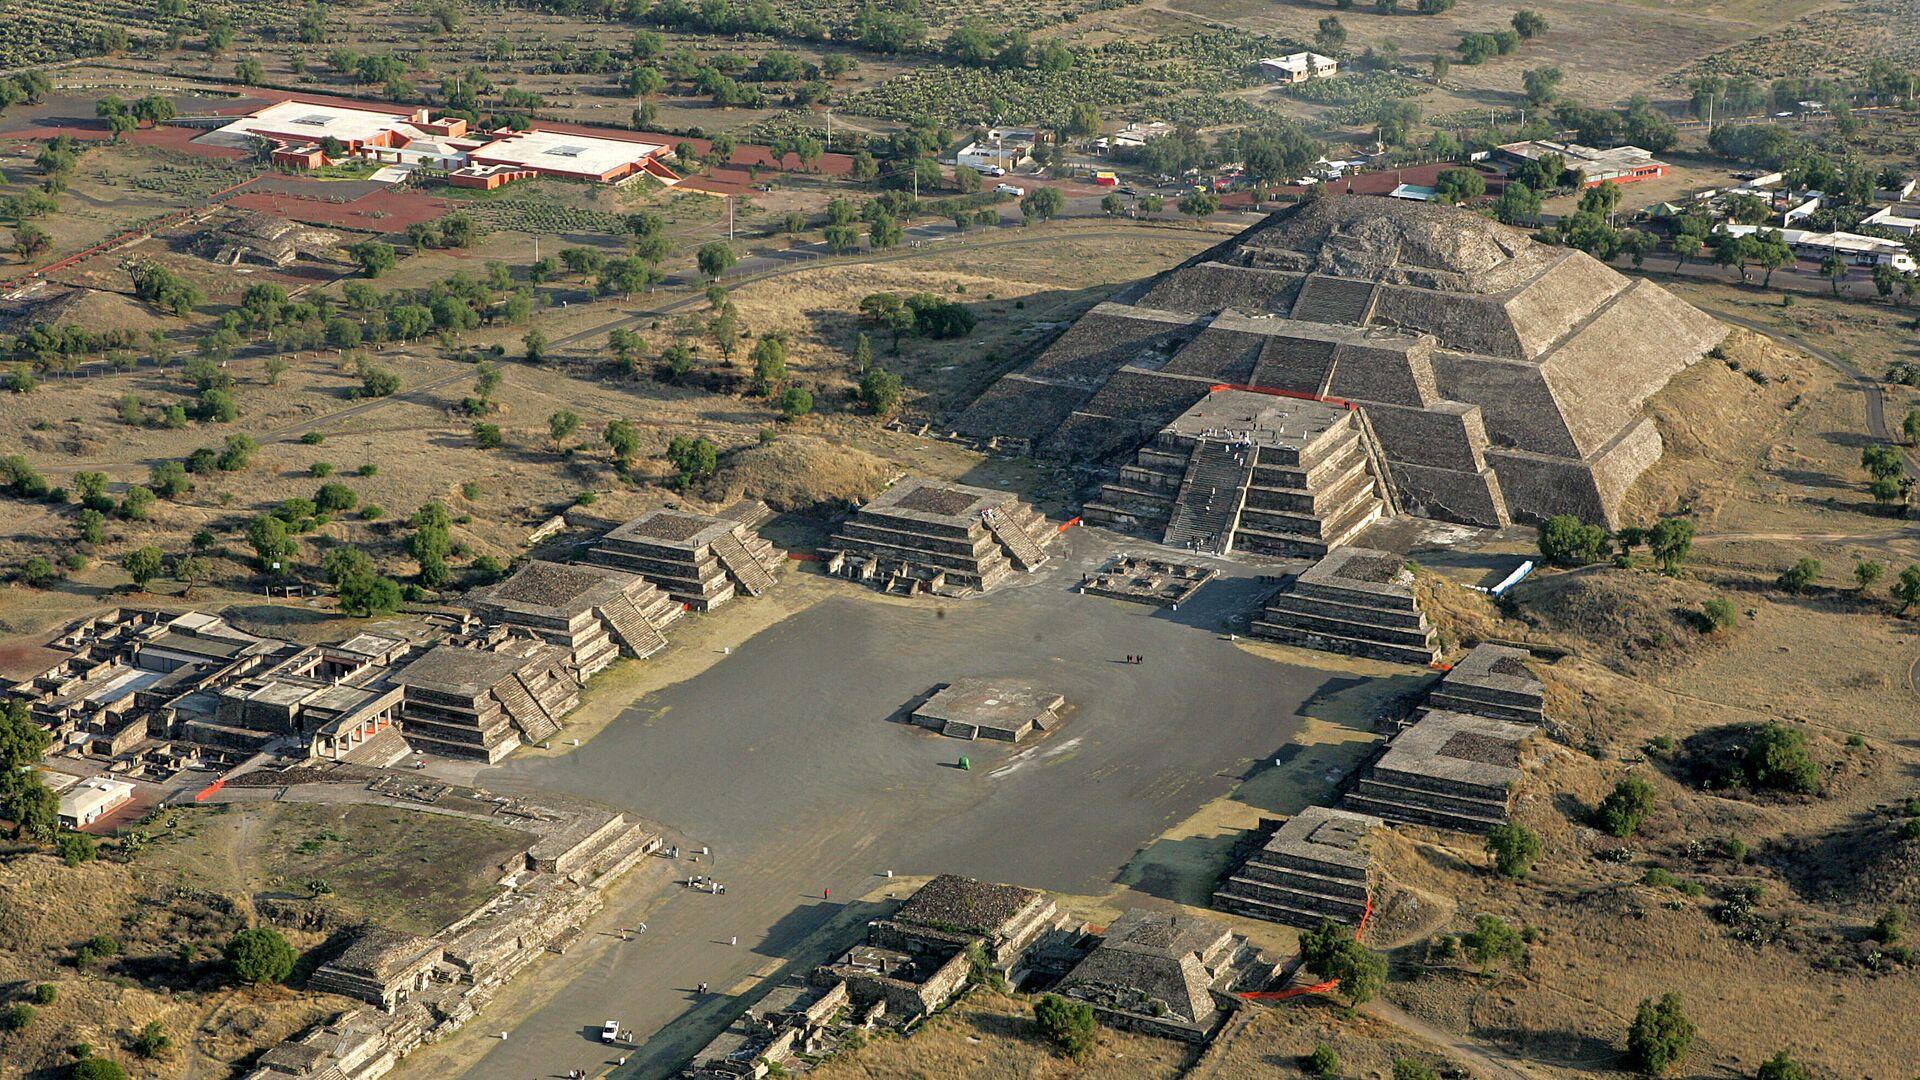 La pirámide de la Luna en Teotihuacán, México - Sputnik Mundo, 1920, 21.09.2021